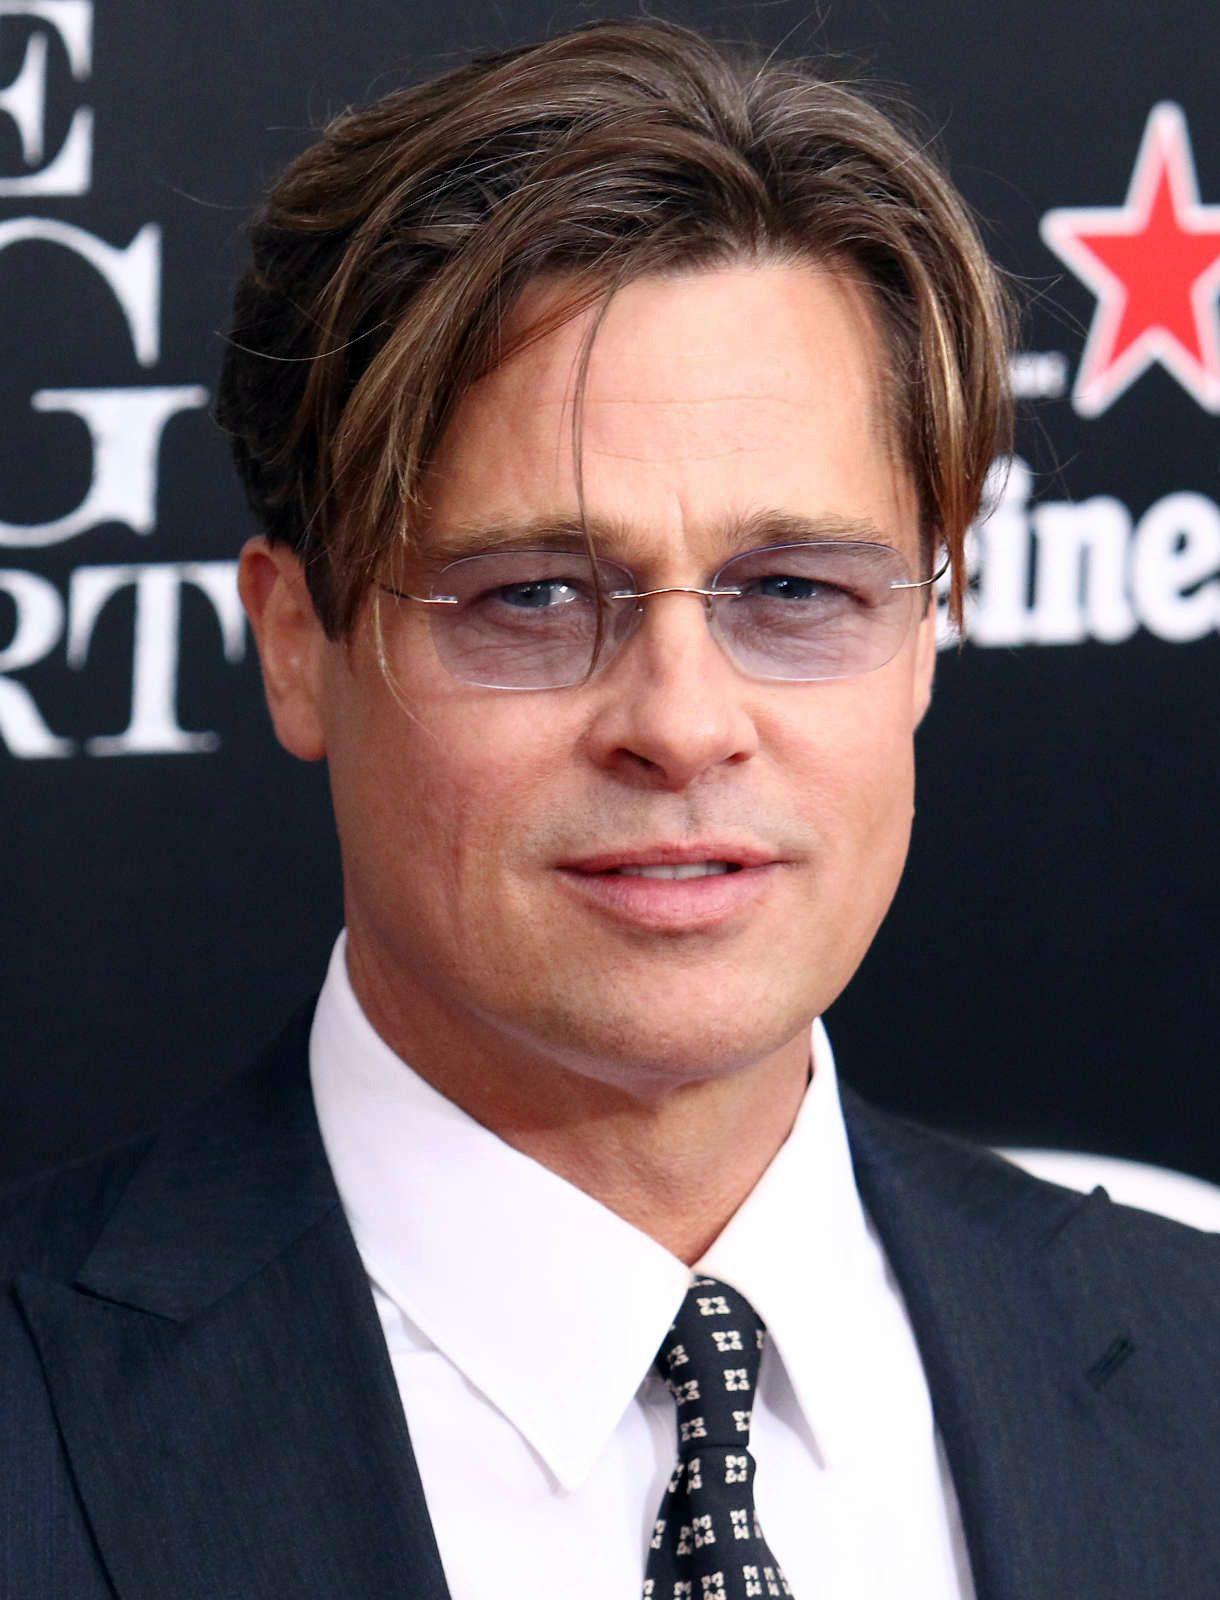 Brad Pitt Curtain Hairstyle